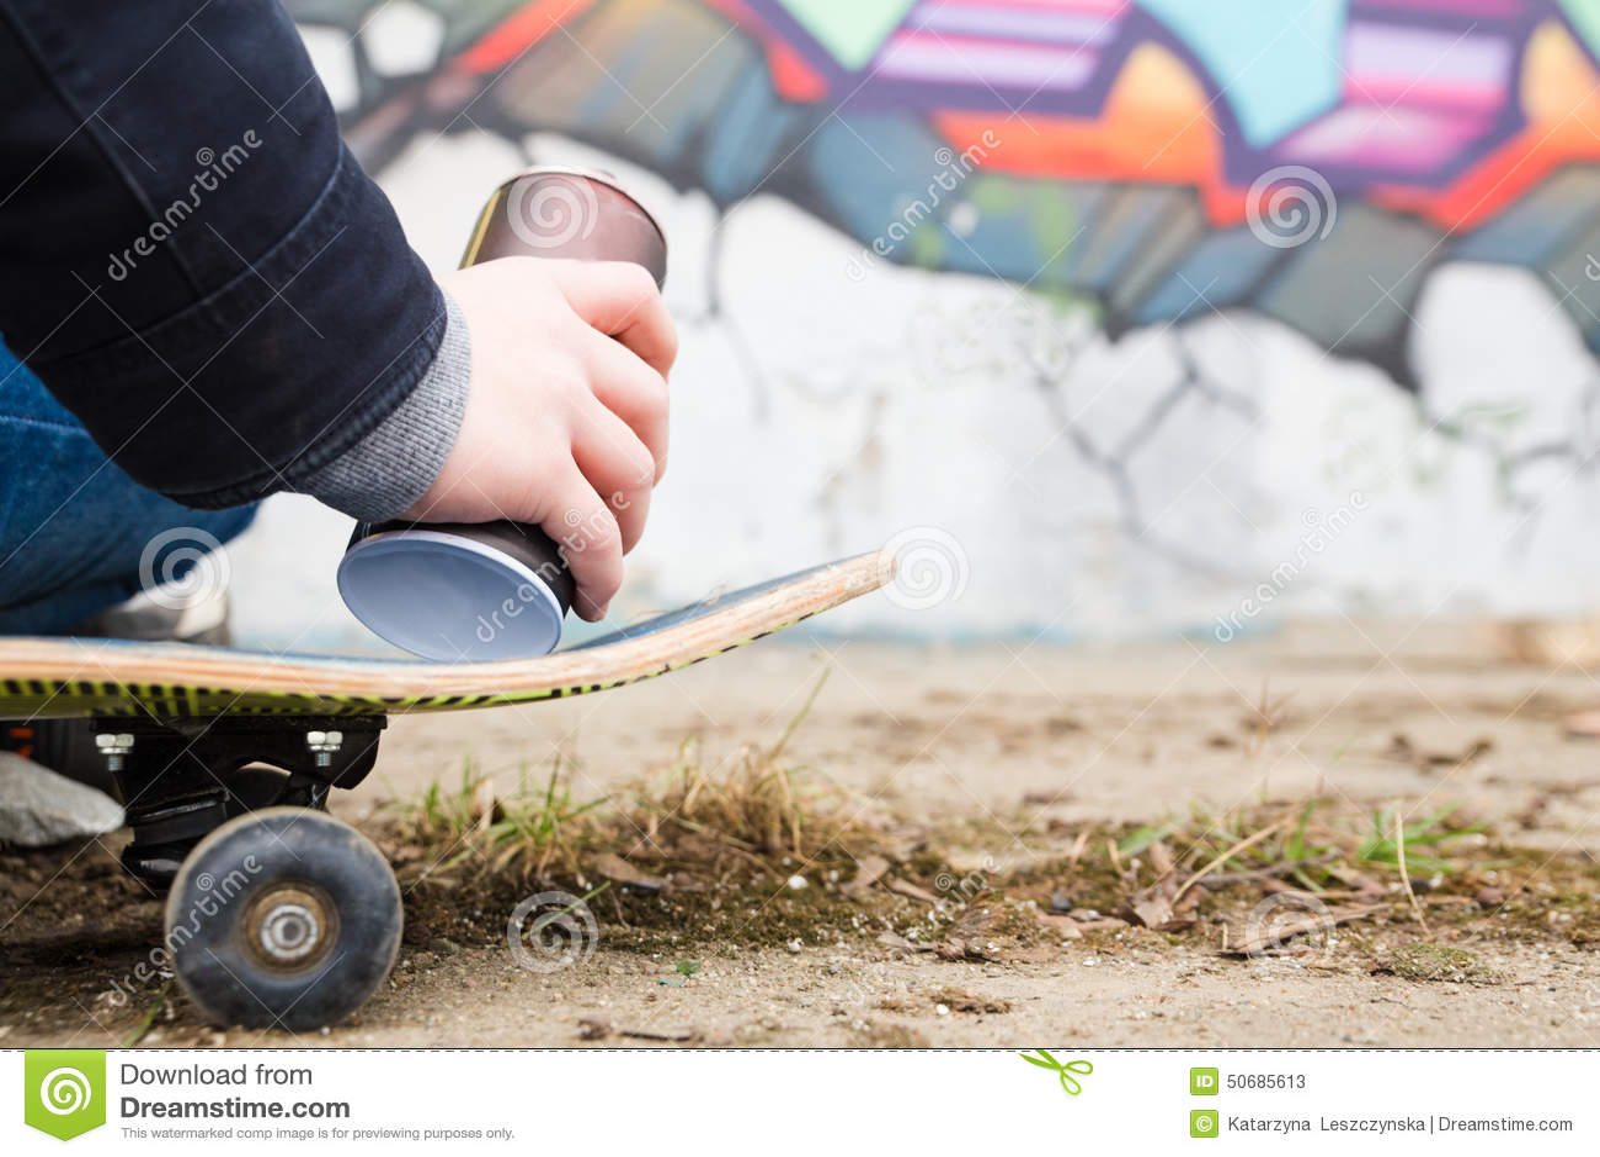 Download 街道画 库存图片. 图片 包括有 图象, 生活, 偶然, 白种人, 子项, 孩子, 逗人喜爱, 少许, 滑板 - 50685613